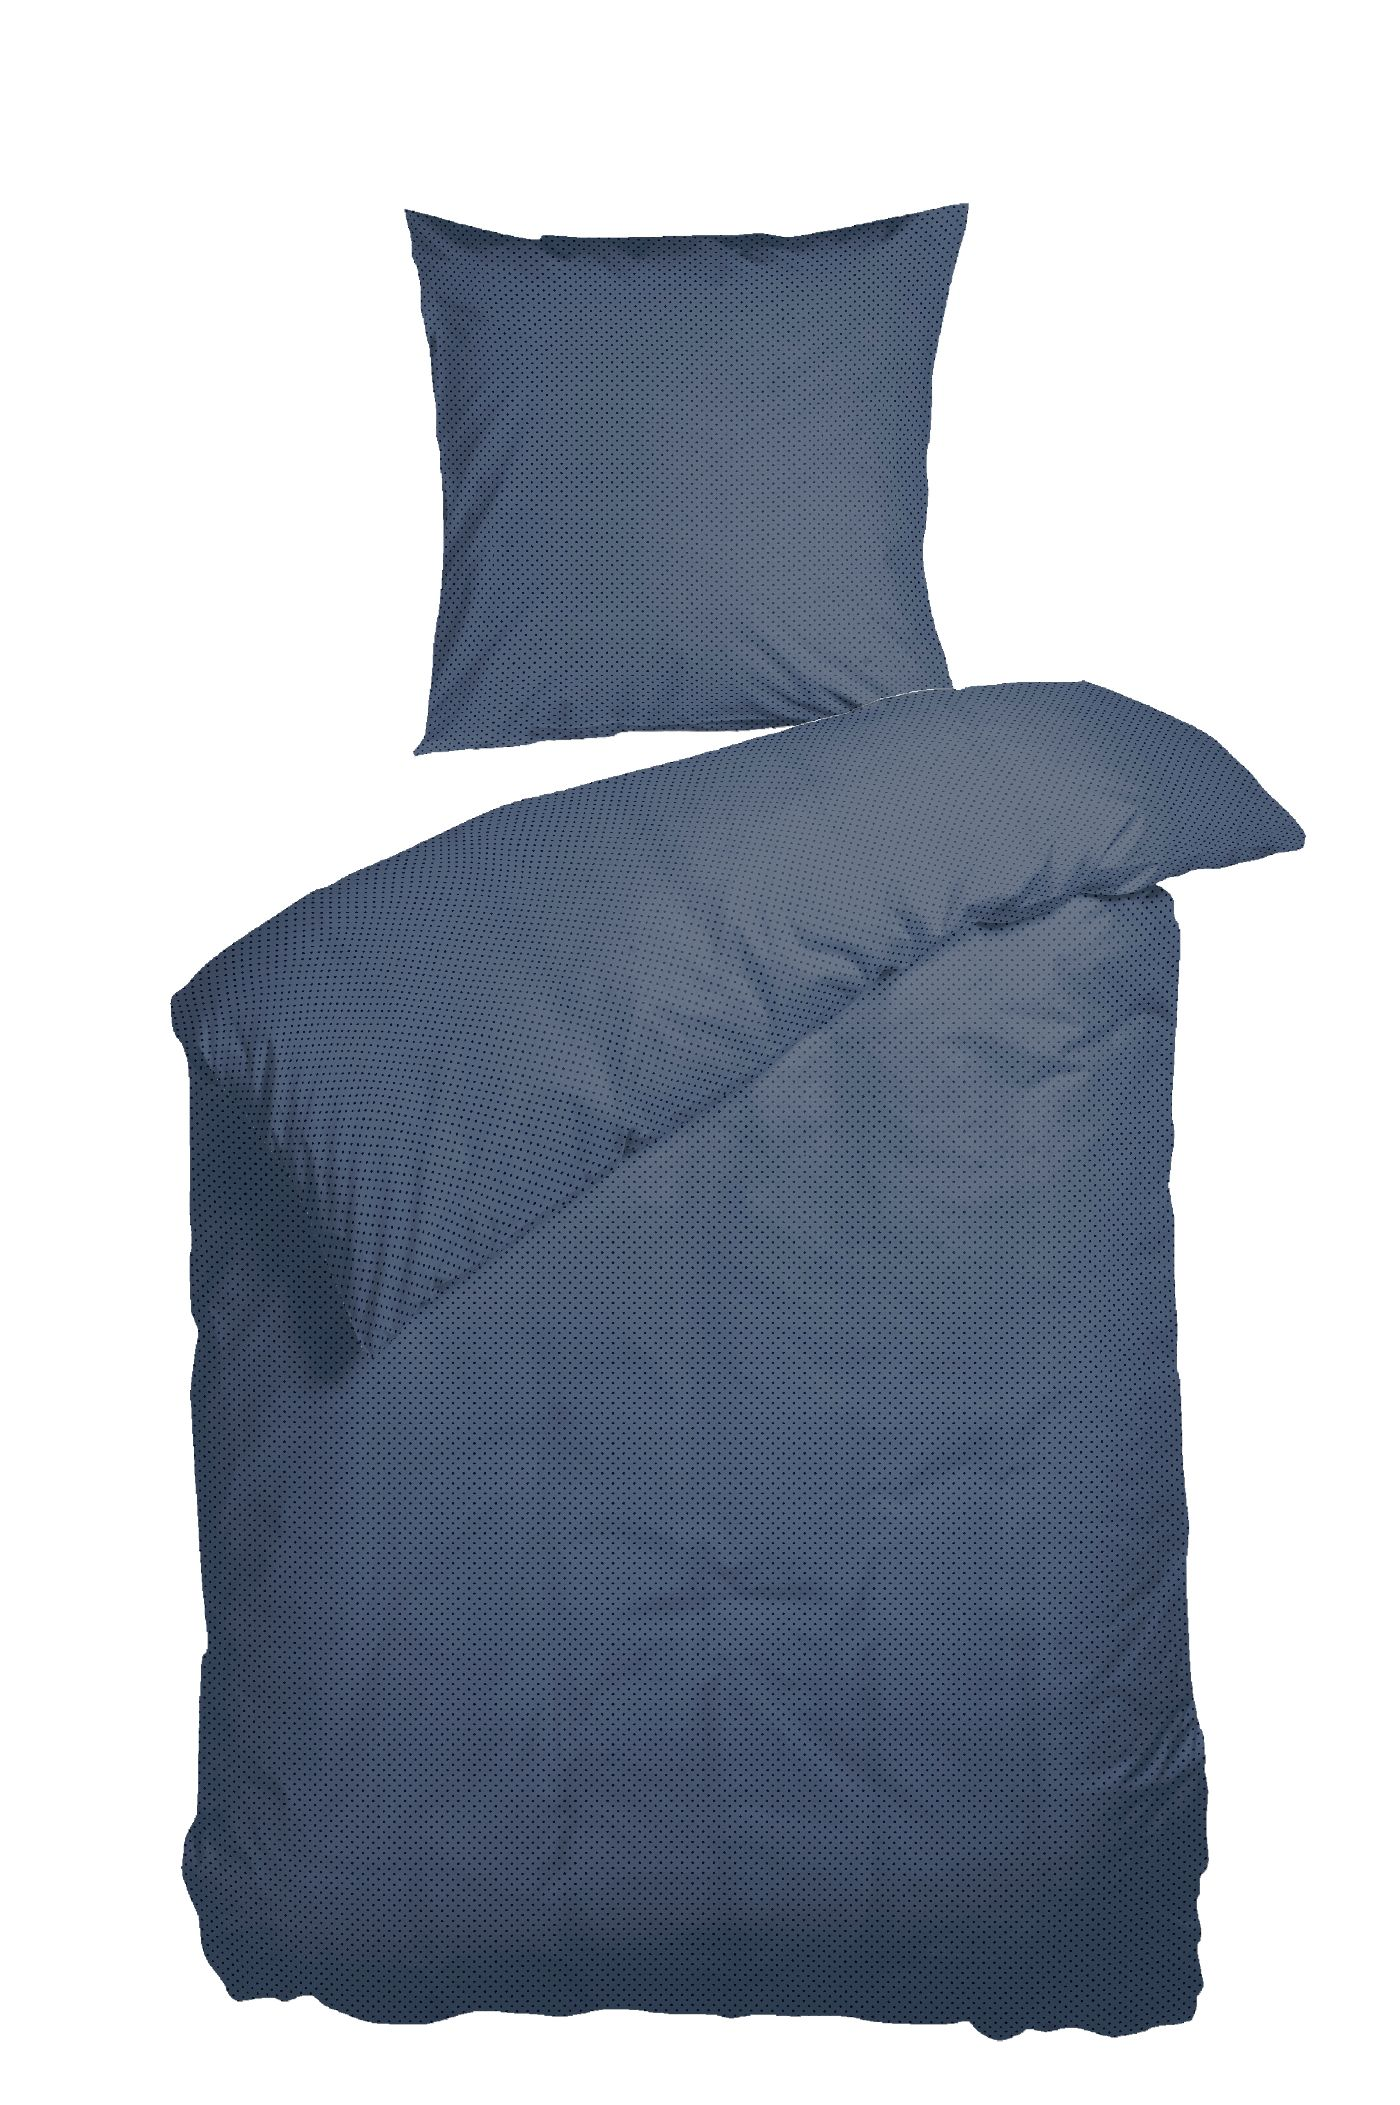 Nordisk Tekstil Morning Dew sengelinned, 140x200 cm, mørkeblå